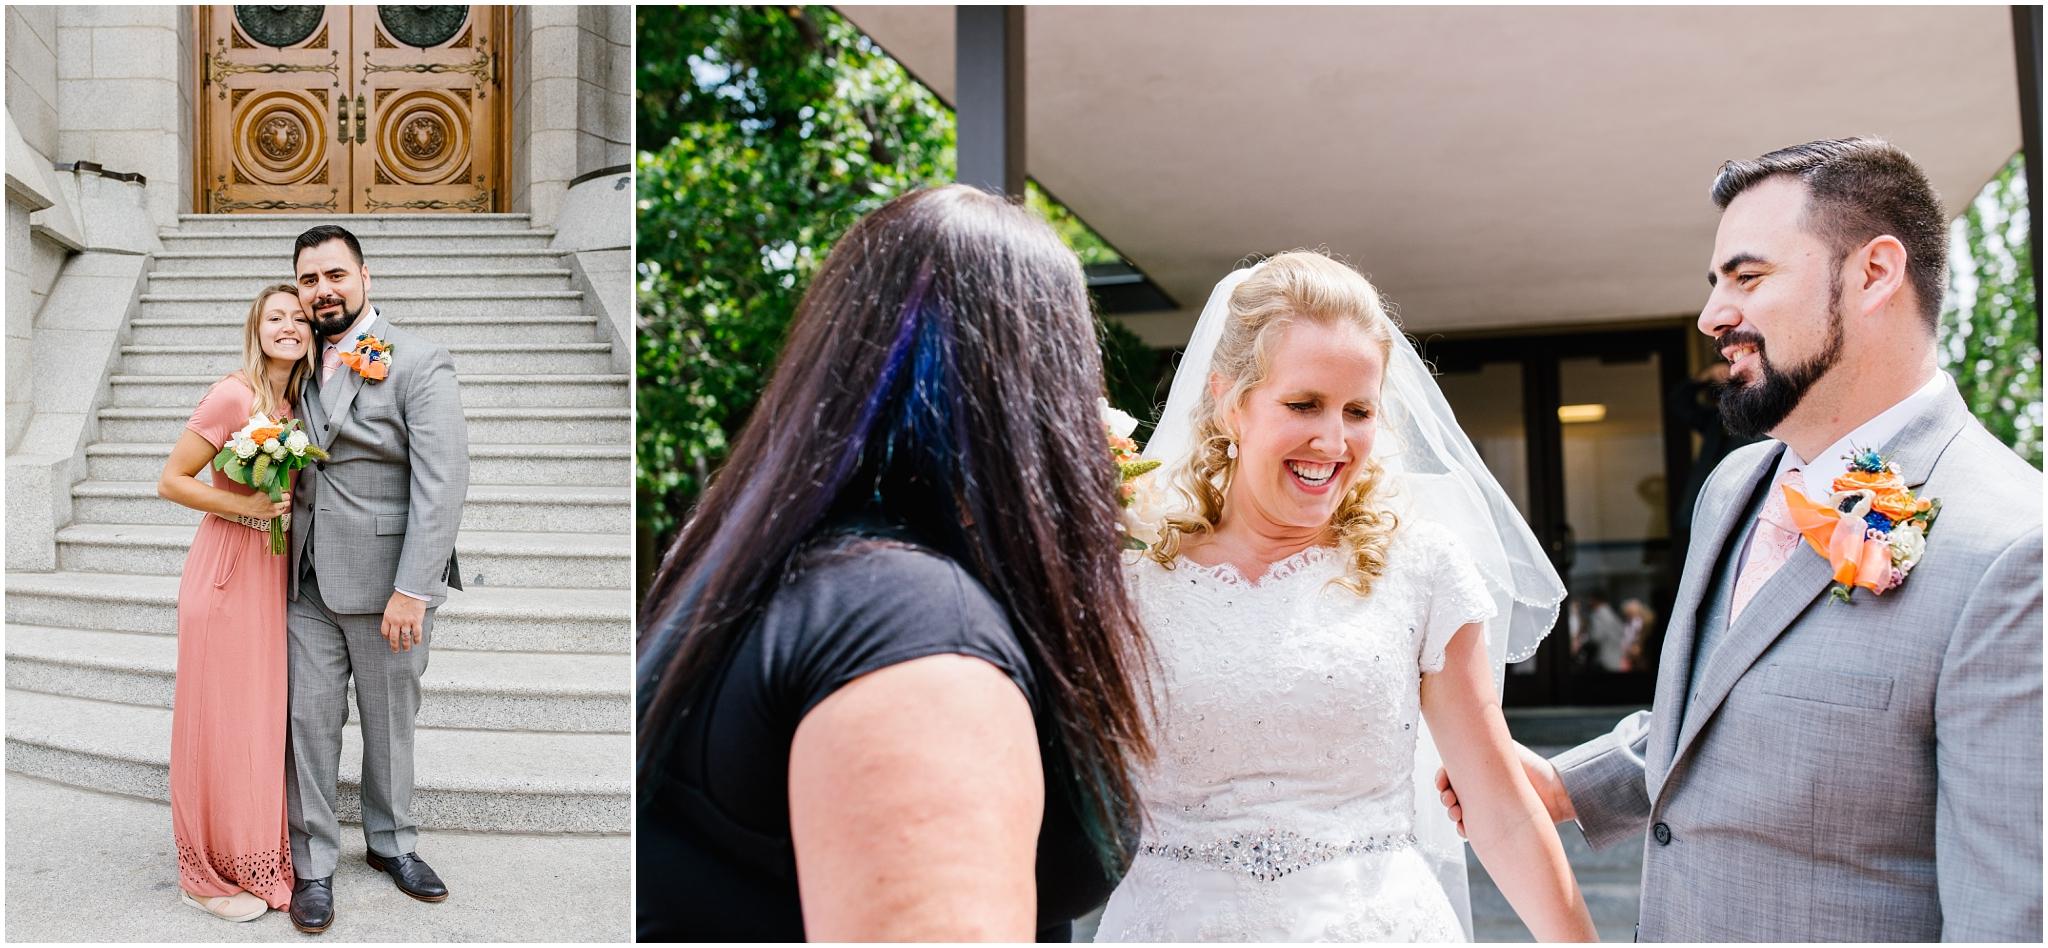 Justin and Melissa-74_Lizzie-B-Imagery-Utah-Wedding-Photographer-Salt-Lake-City-Temple-The-Grand-Ballroom.jpg